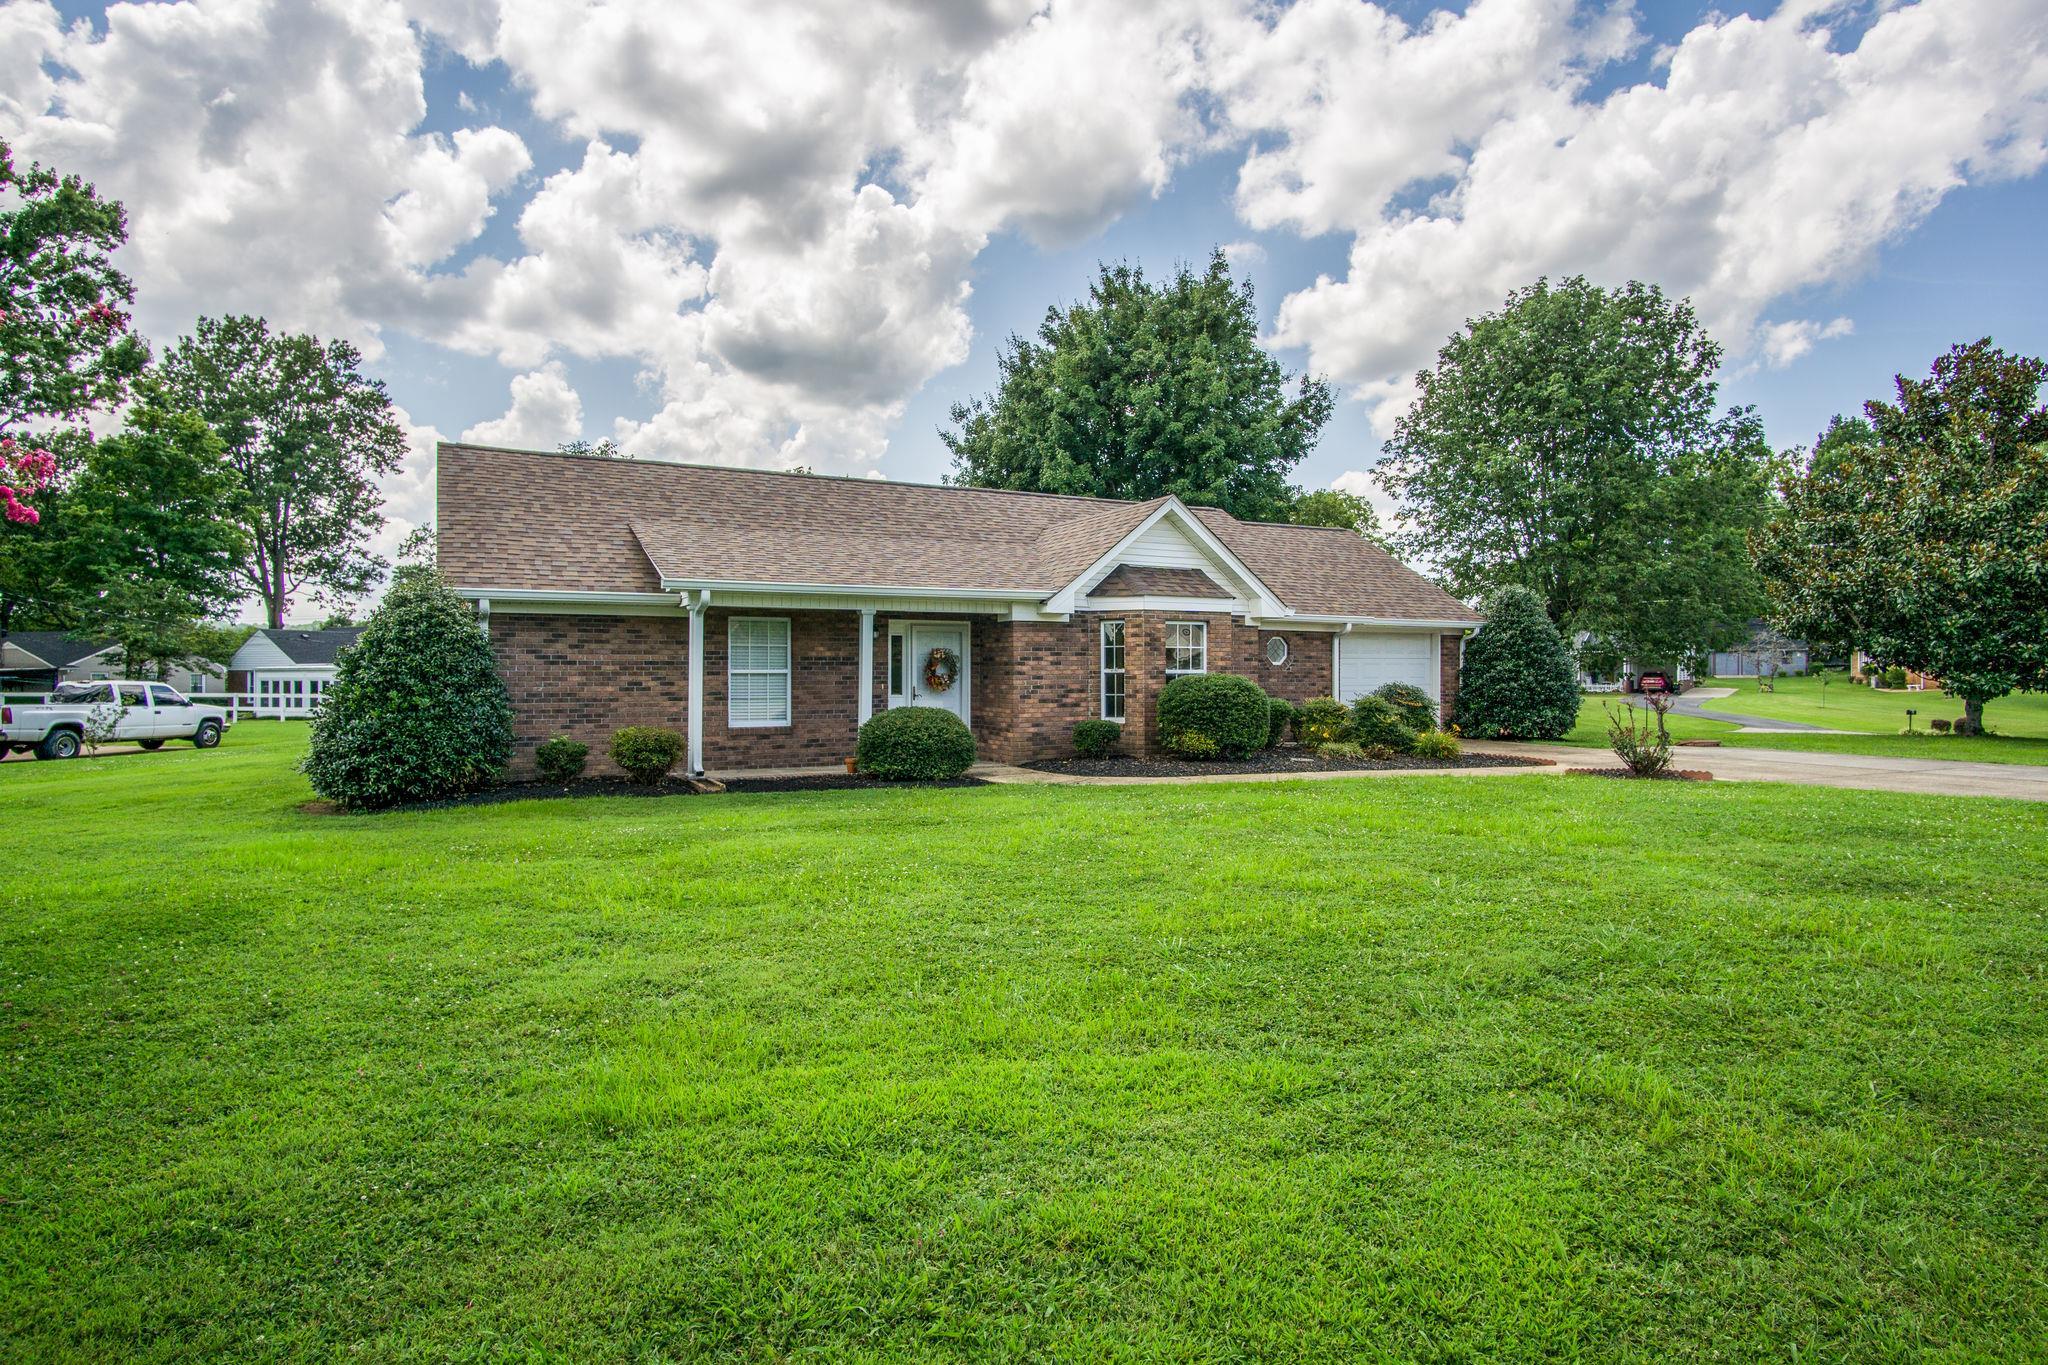 350 Beechcrest Cir, Lewisburg, TN 37091 - Lewisburg, TN real estate listing